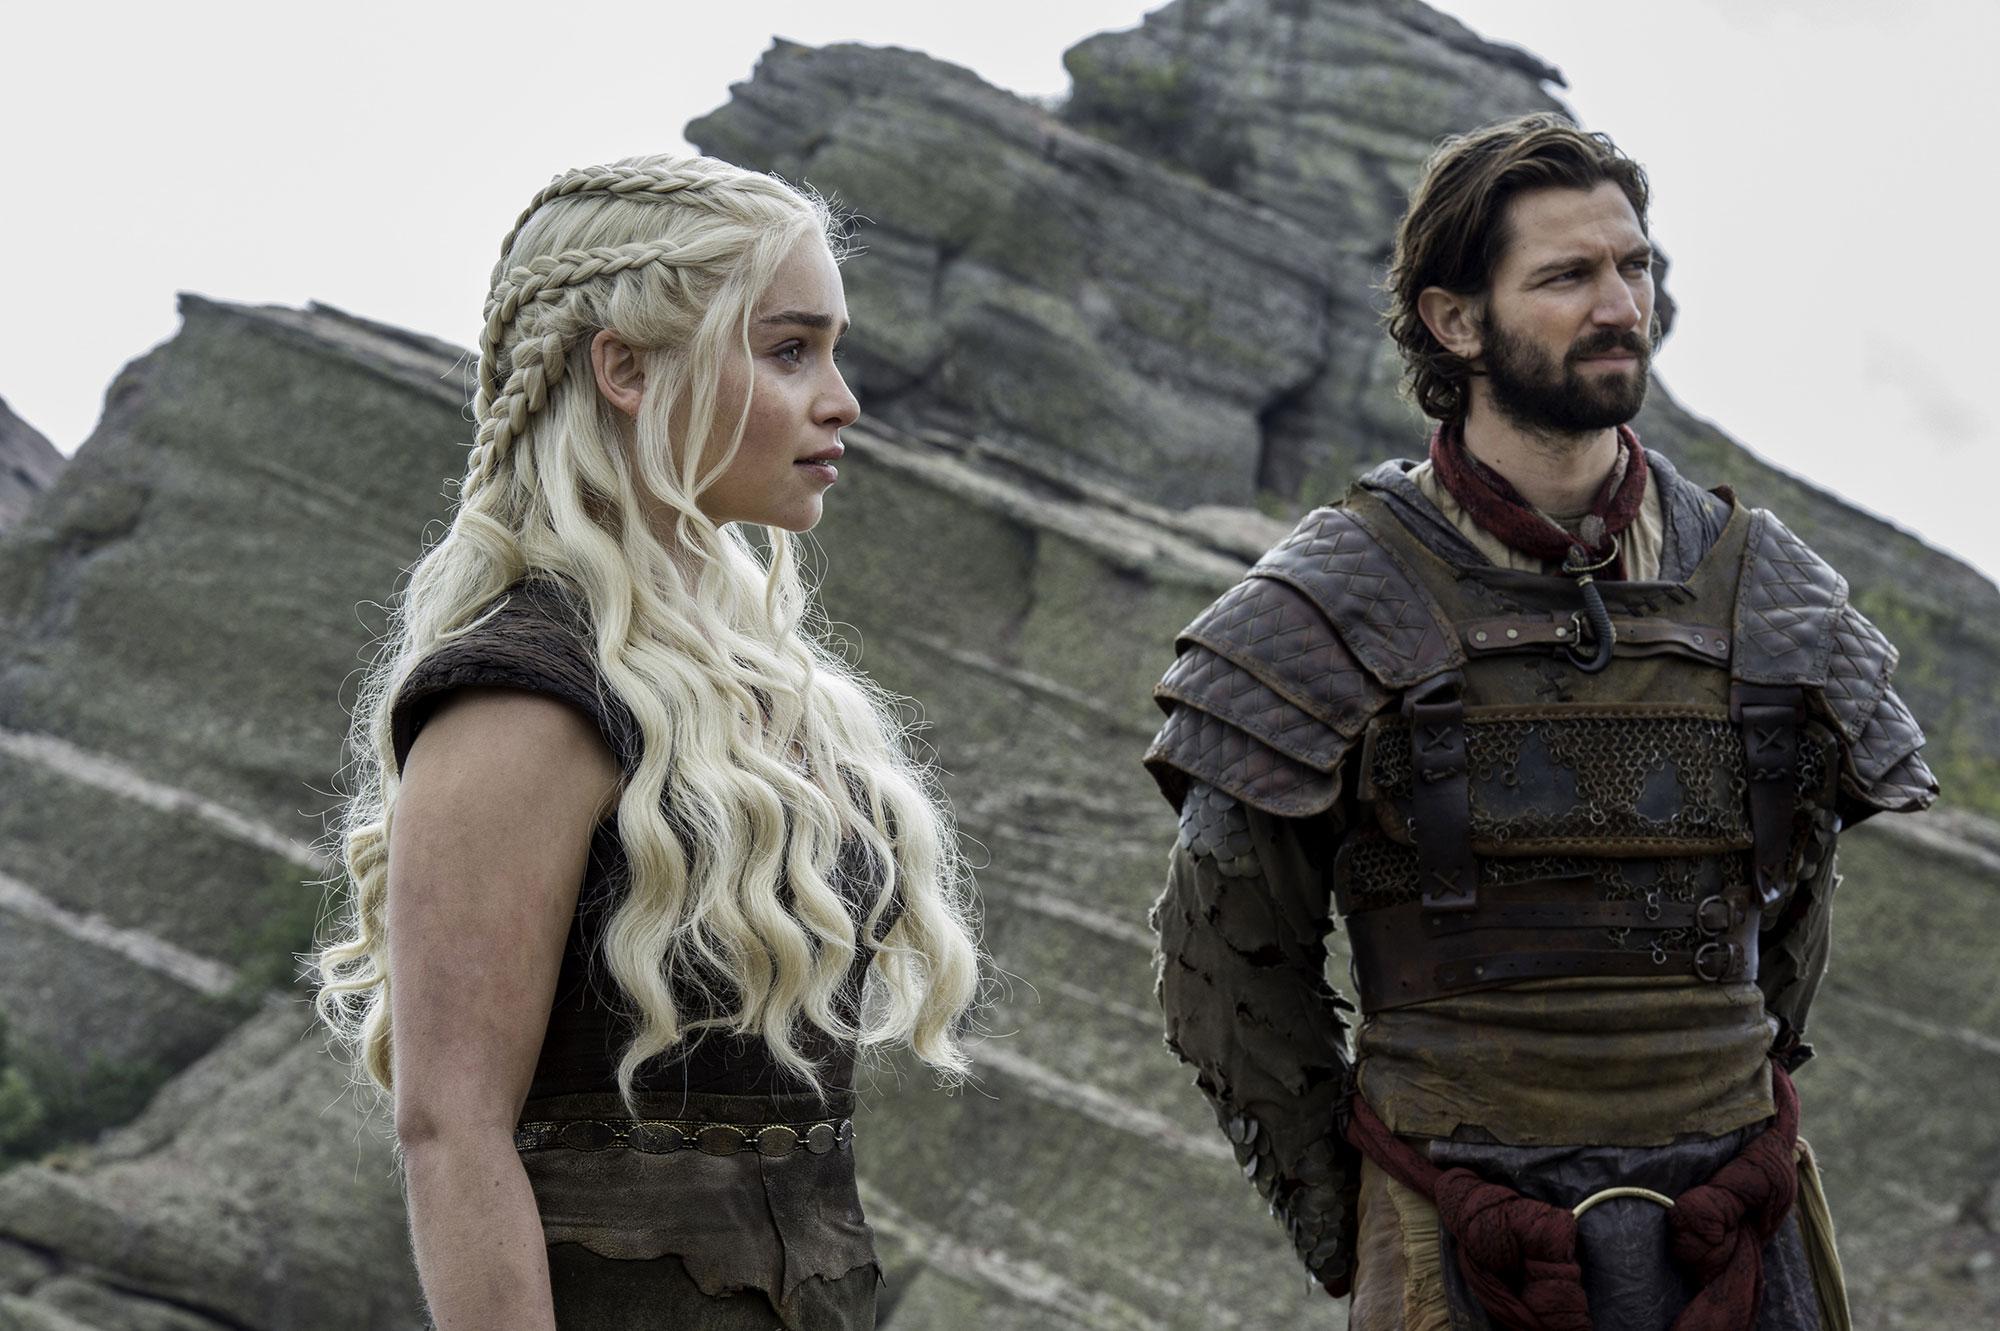 Game of Thrones braids hairstyles hair Emilia Clarke, Michiel Huisman - Showing off that enviable length, Khaleesi rocked an array of Dutch plats with her wavy, waist-grazing locks in season six.